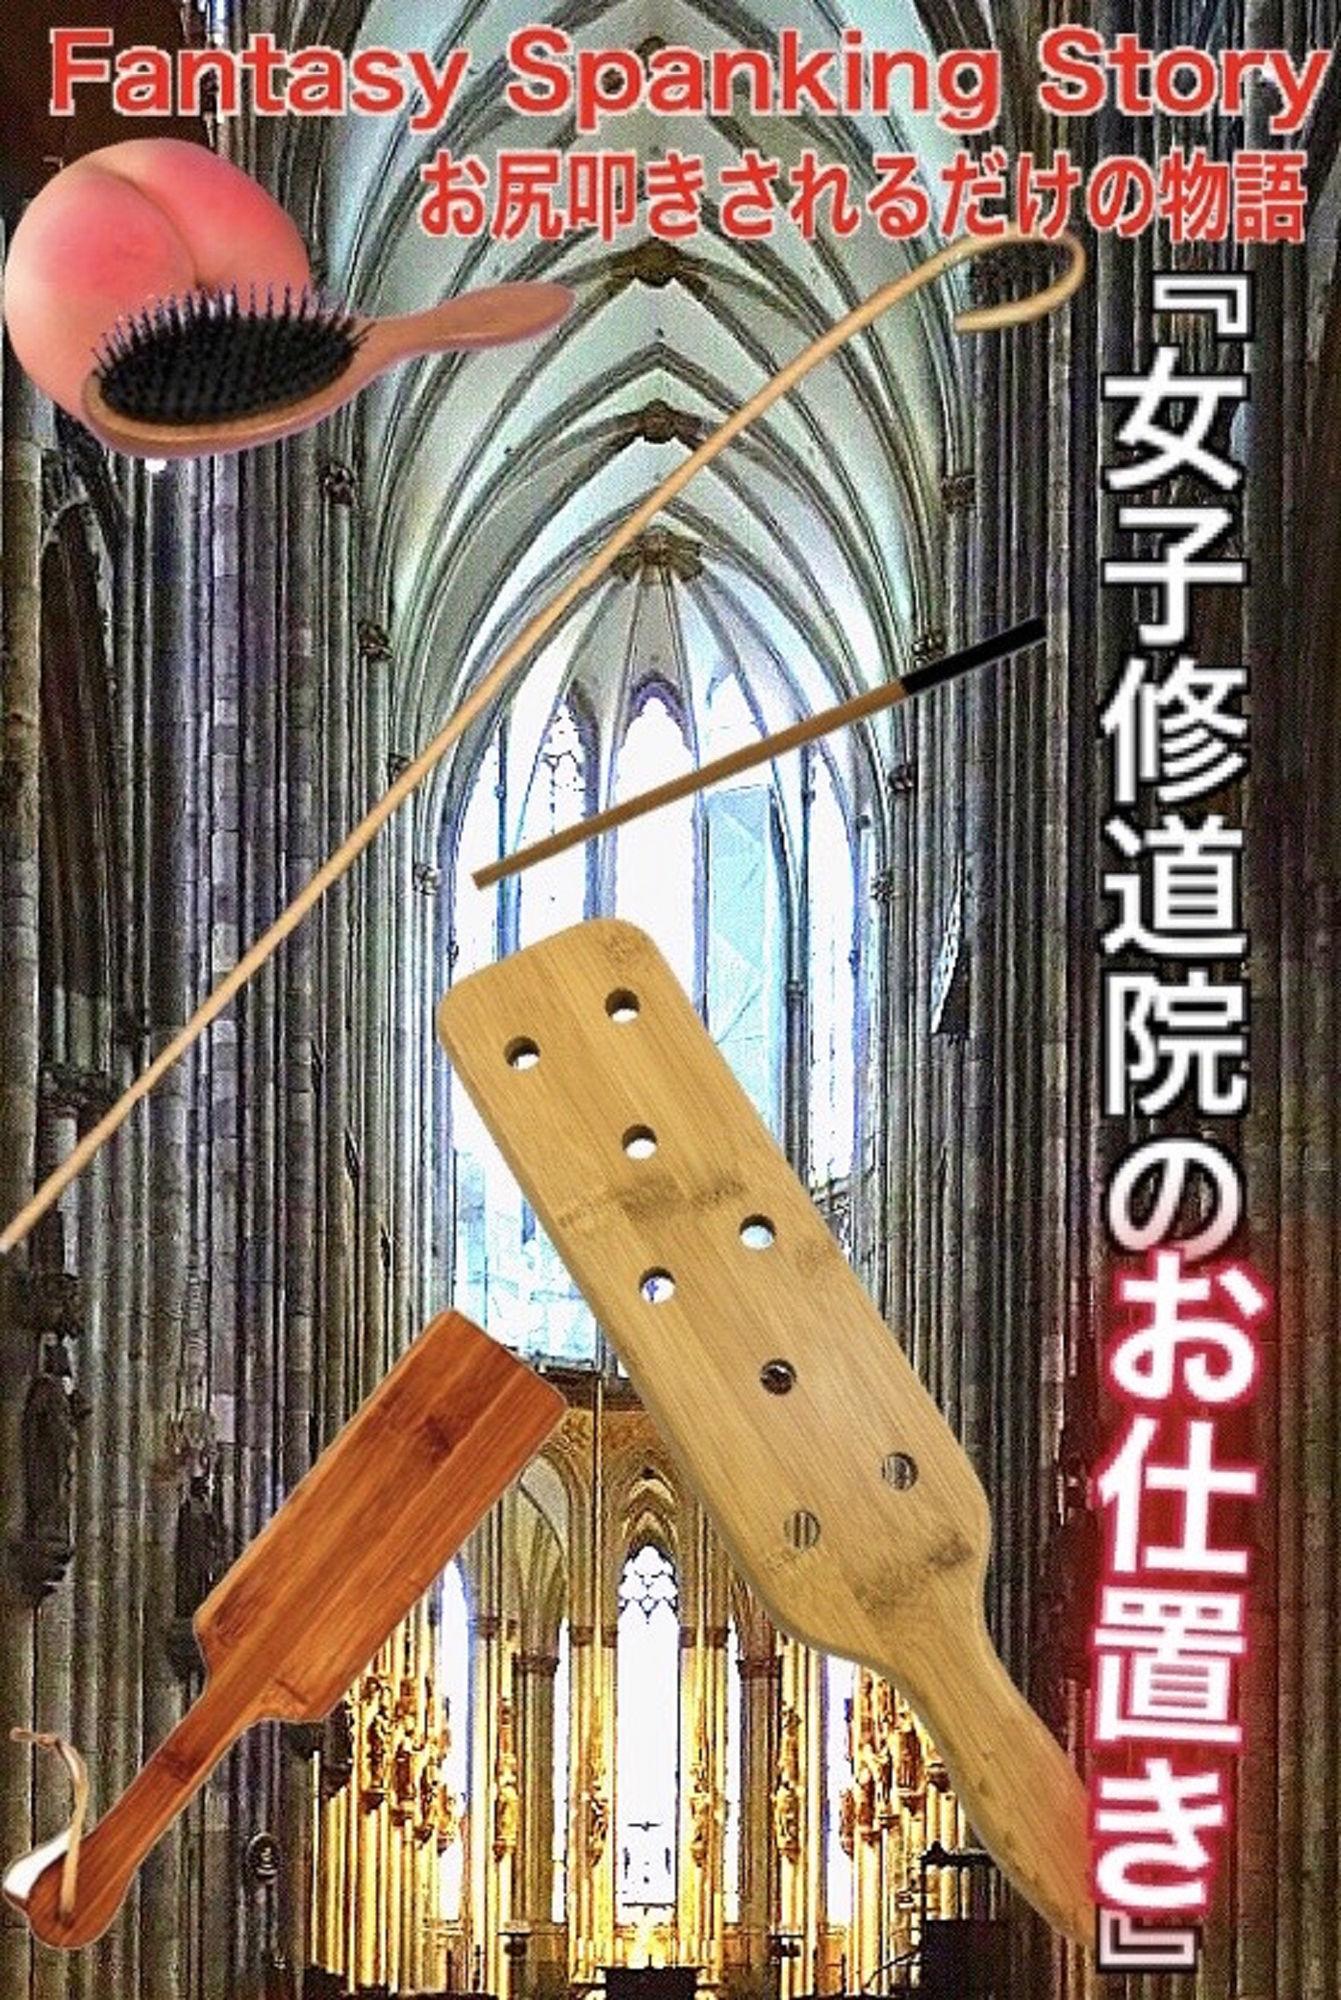 Fantasy Spanking Story(お尻叩きされるだけの物語)Vol.1女子修道院のお仕置き